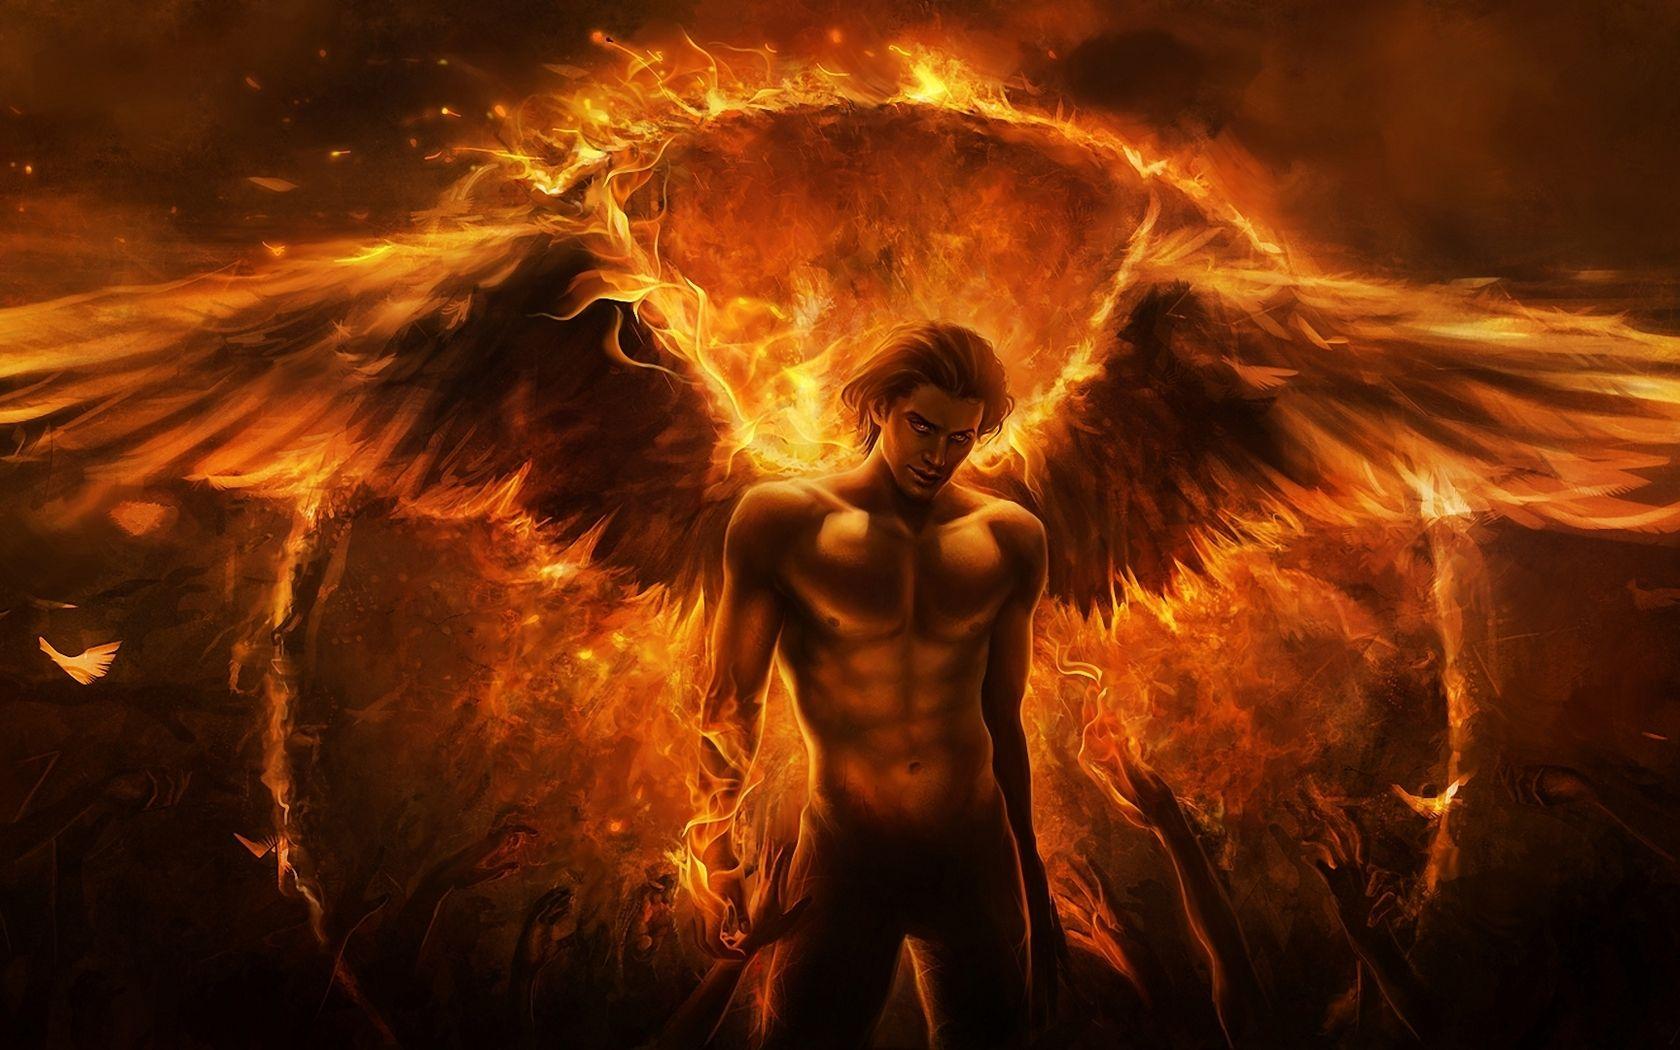 Evil Wallpaper Dark Horror Fantasy Angels Fire Evil Demon Satan Occult Wallpaper Angel Wallpaper Angel Art Angel Fire